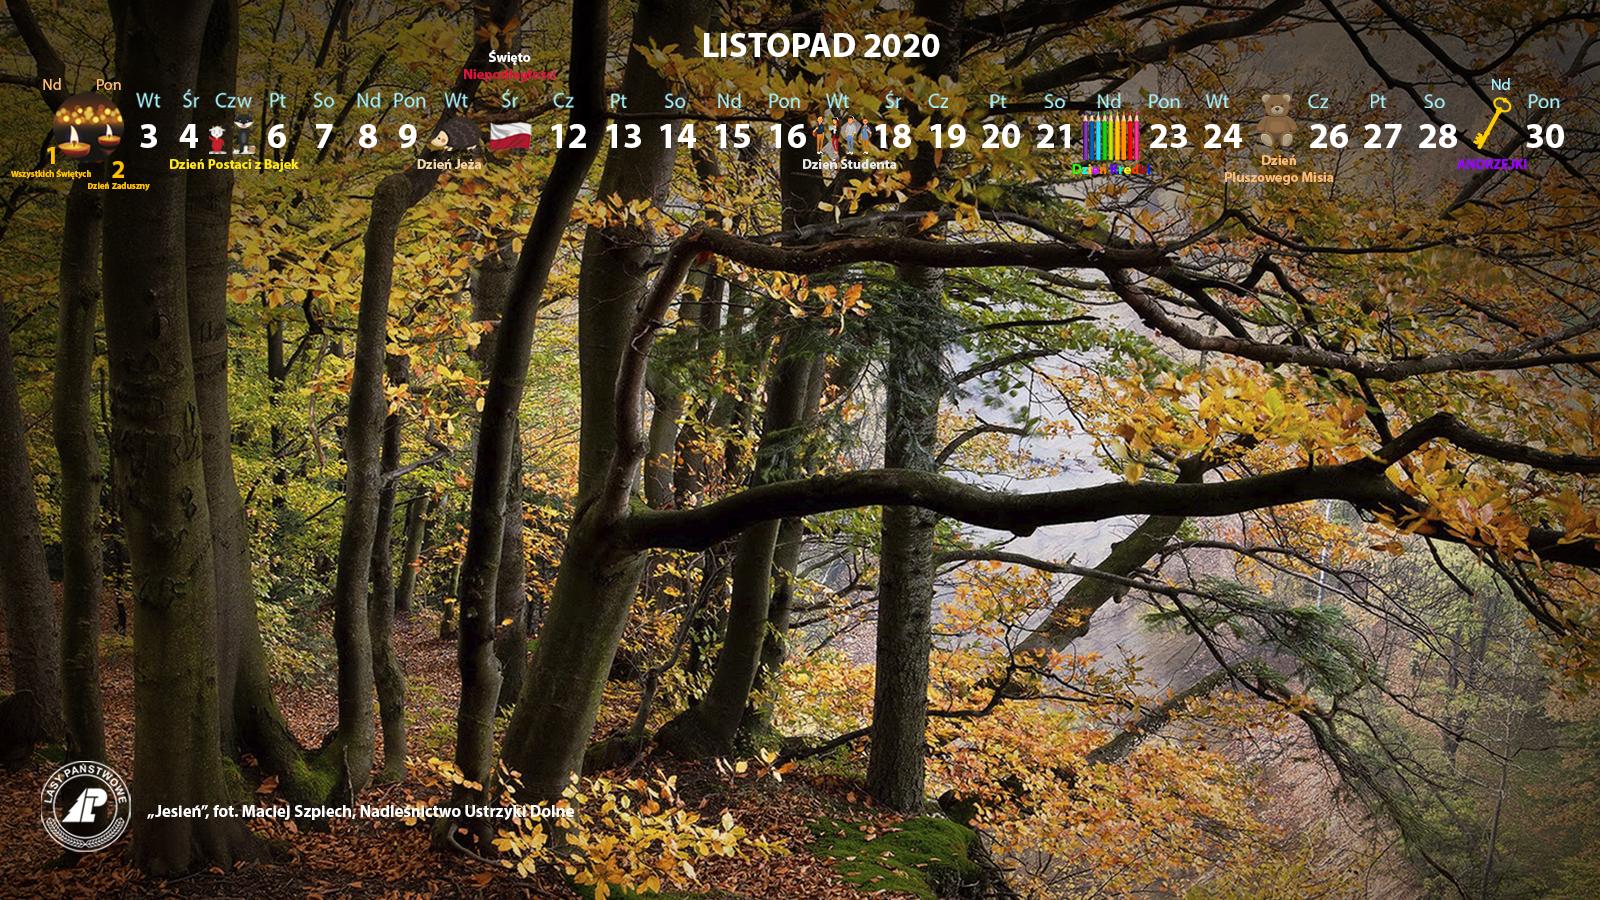 Kalendarz_listopad_2020_1600x900[1].jpg